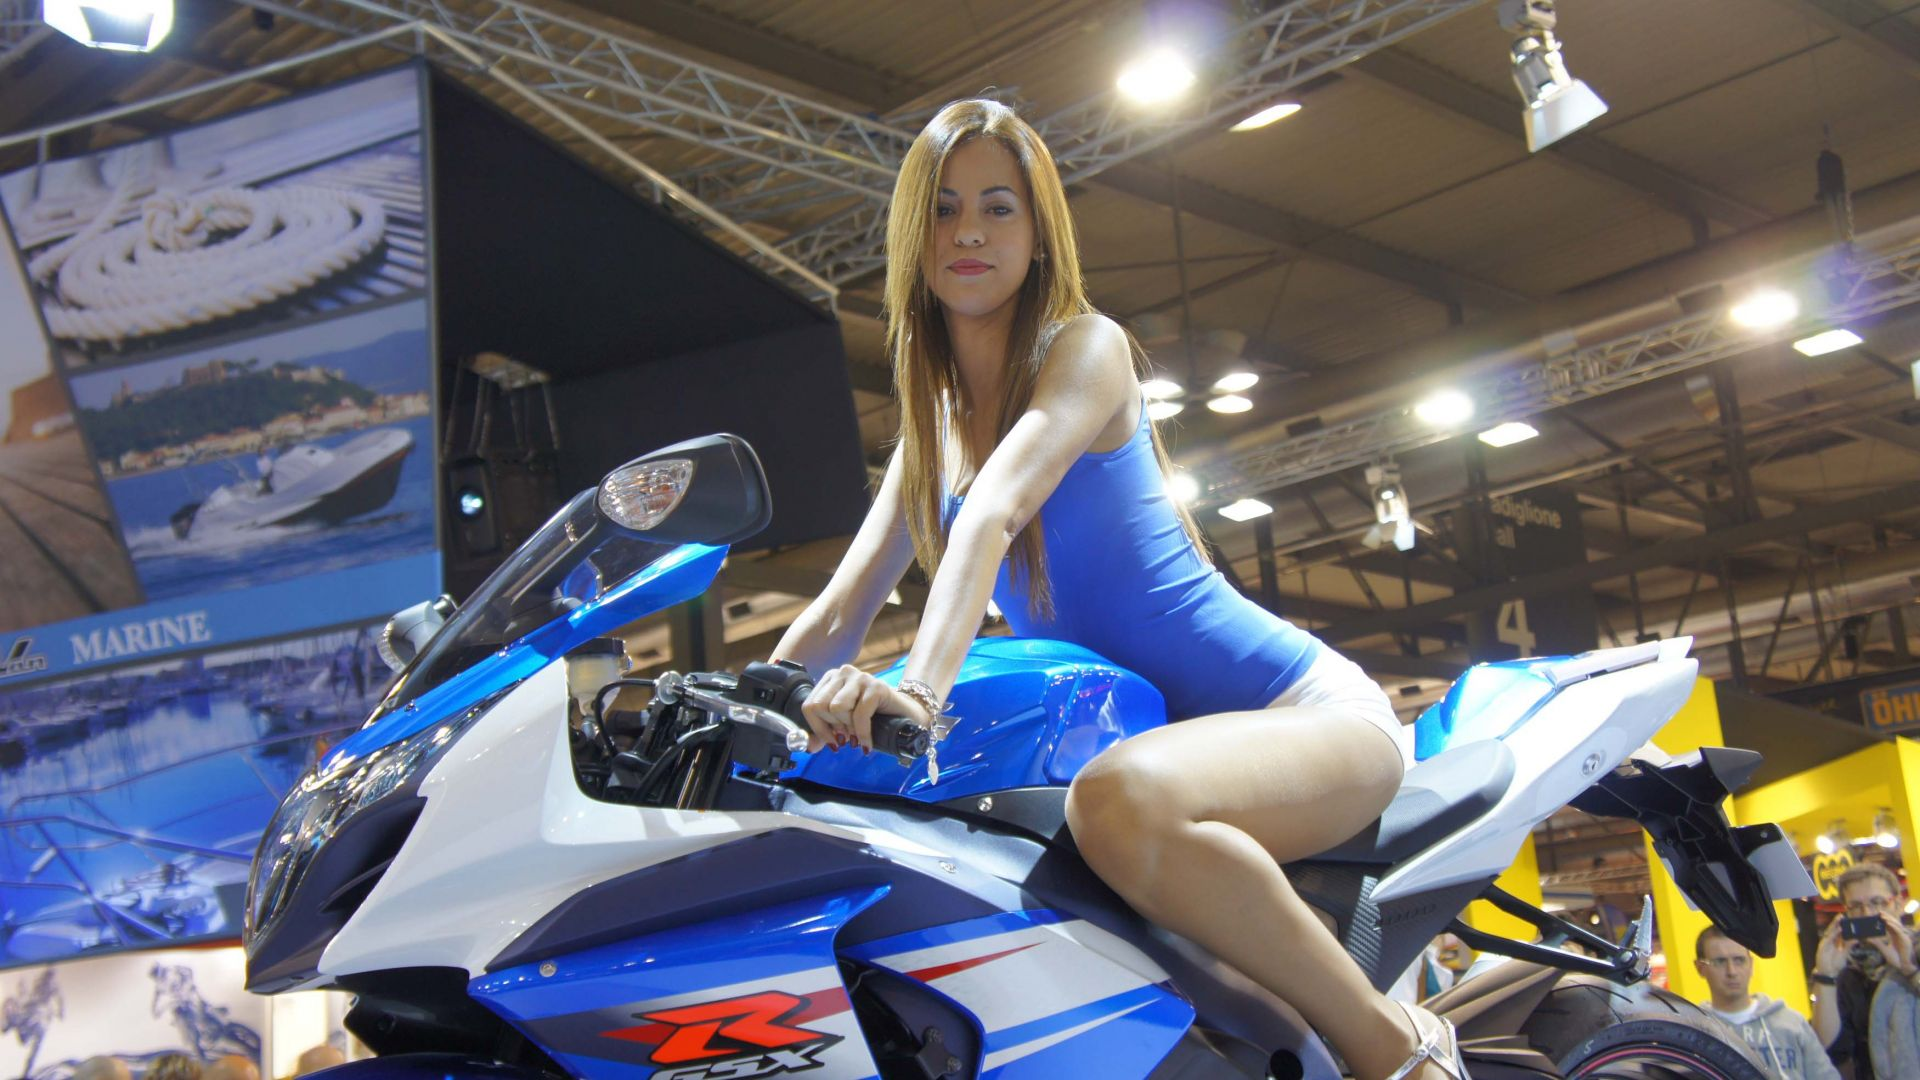 I nostri video: Eicma 2011: lo stand Suzuki - MotorBox